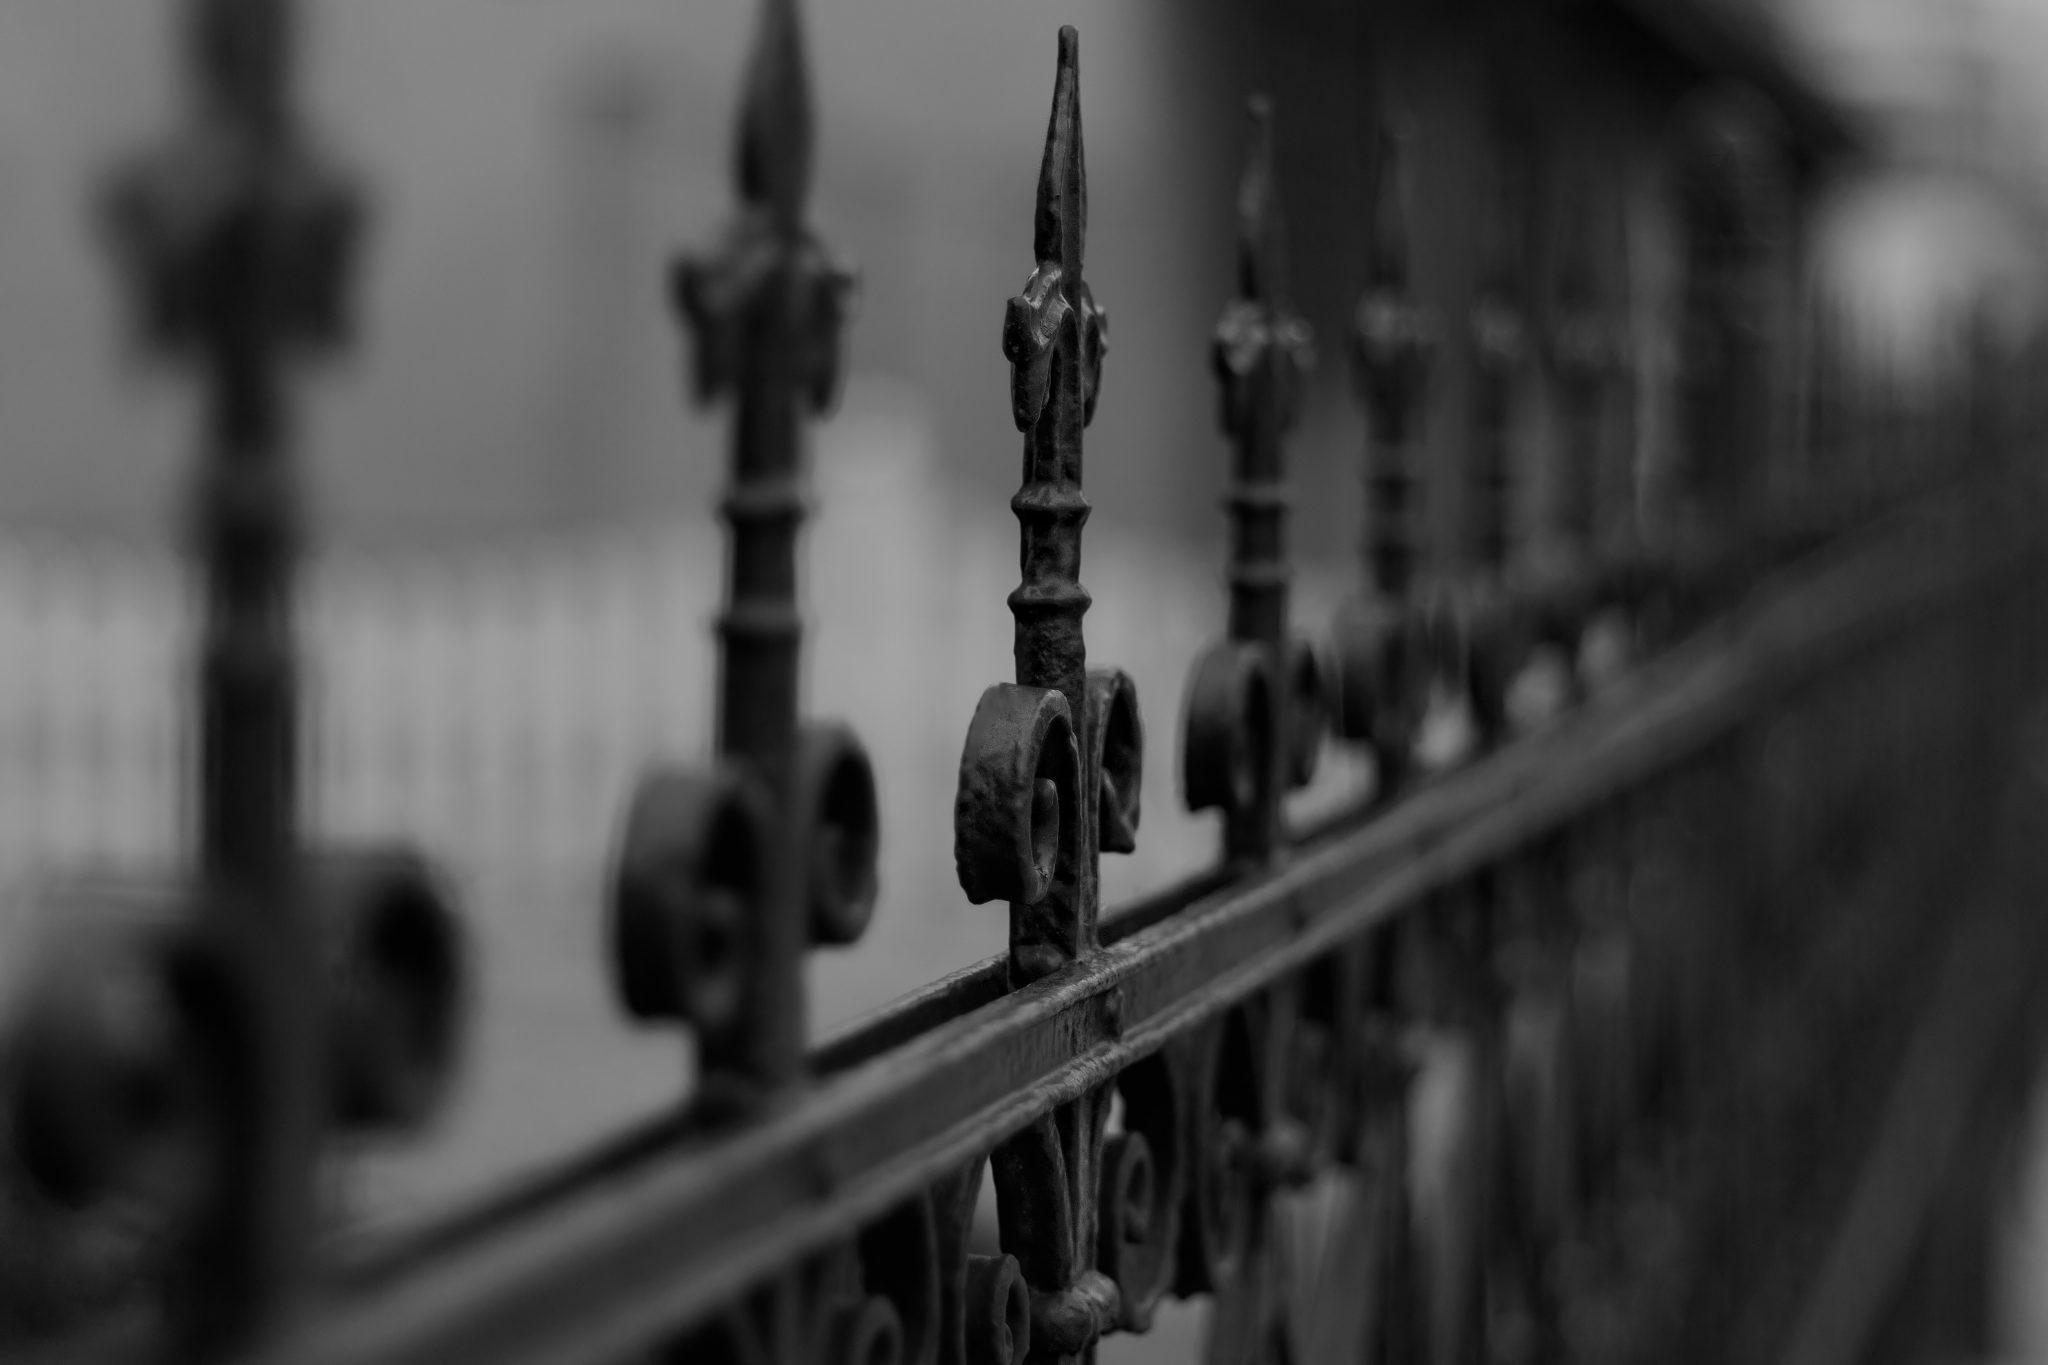 fence-77940